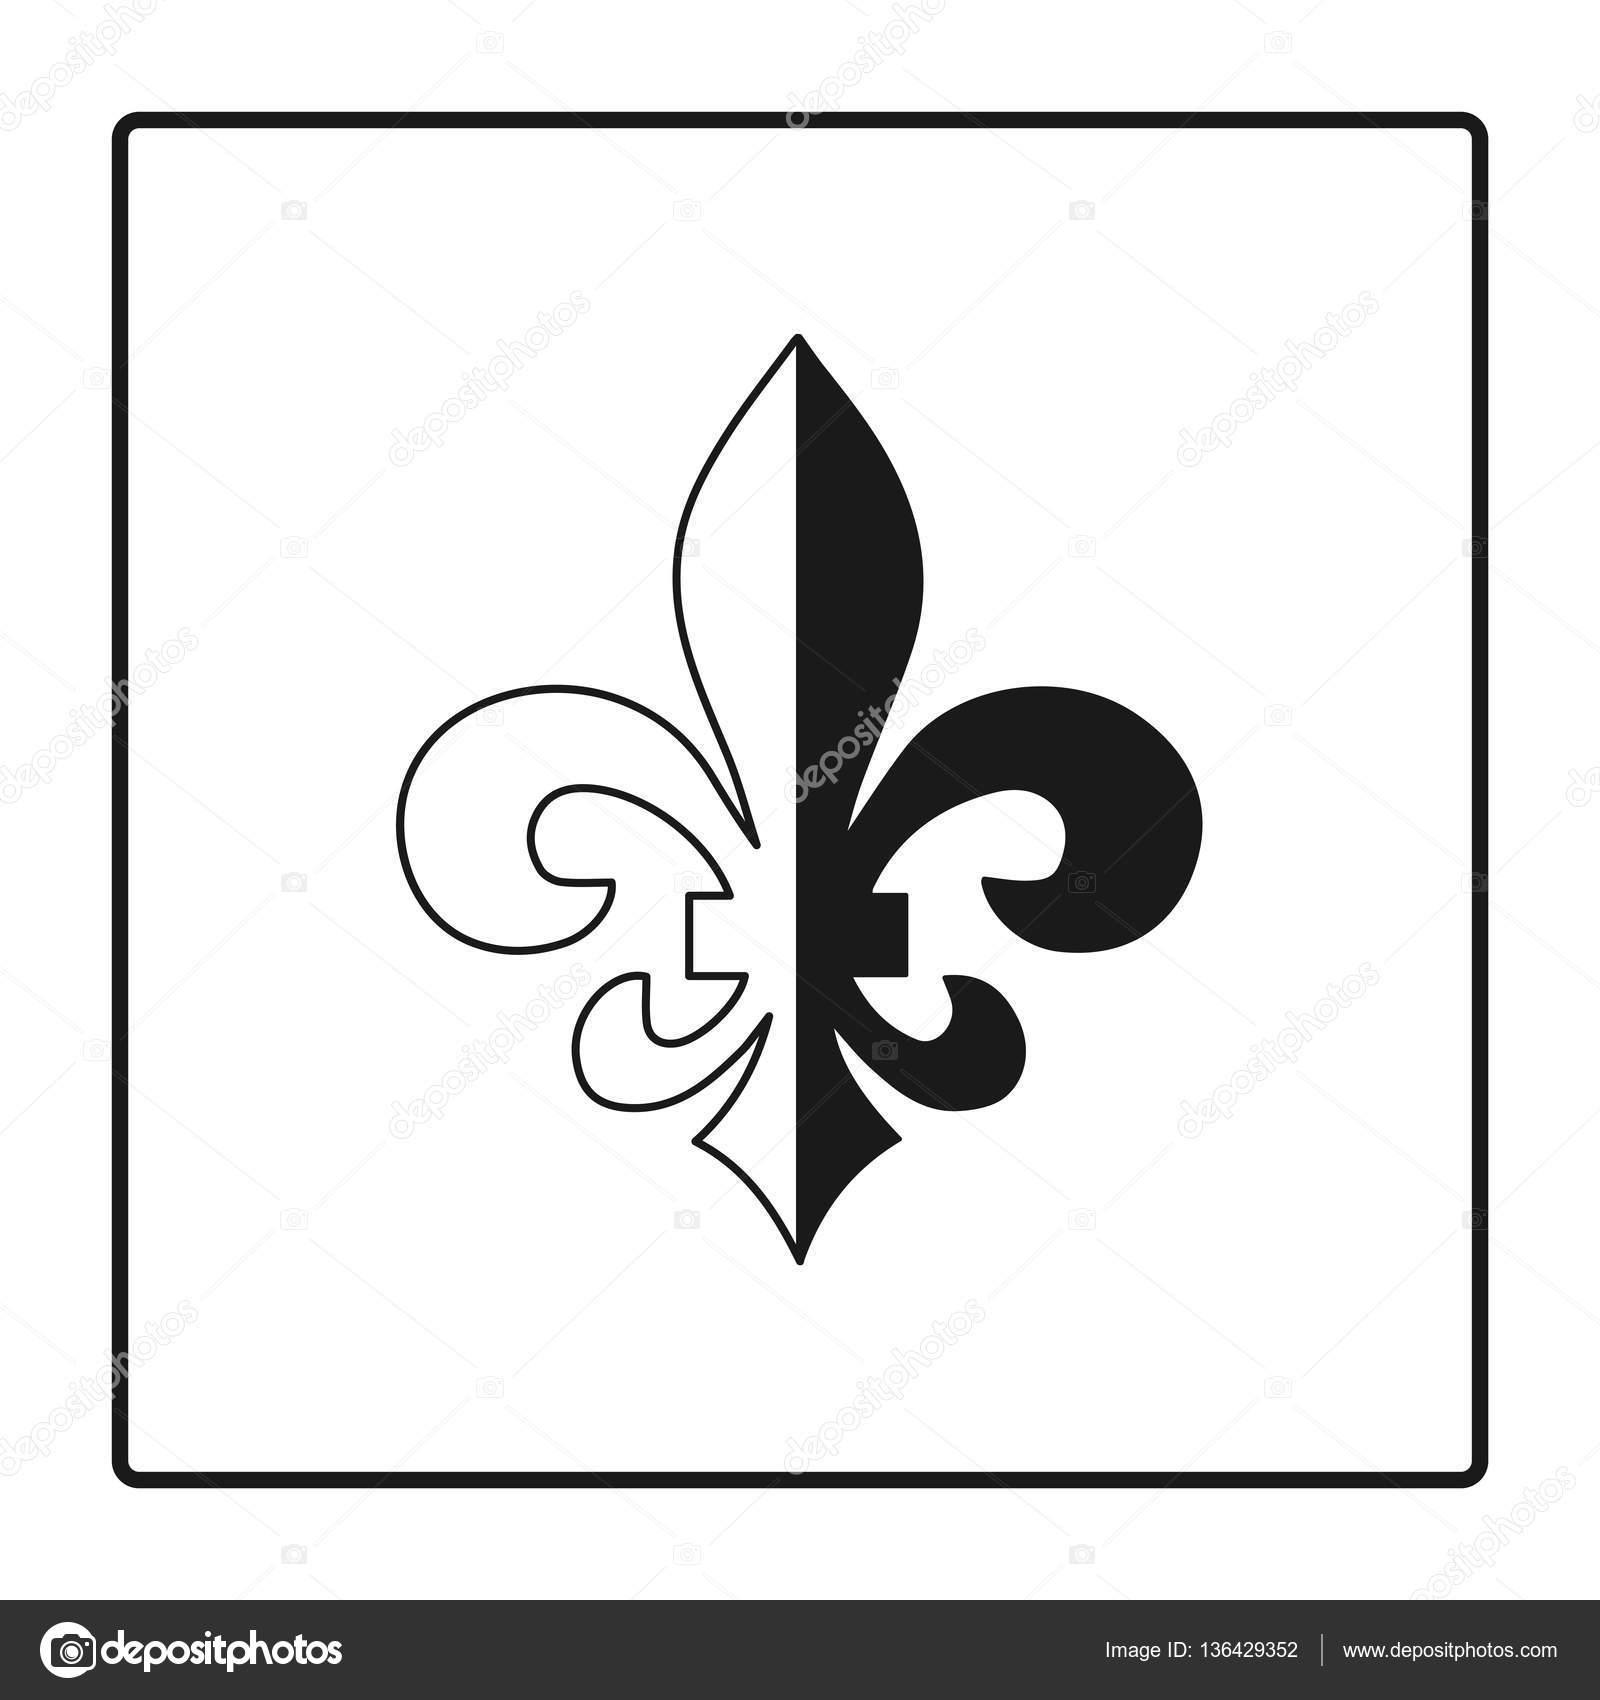 De lis symbol silhouette heraldic symbol vector illustration fleur de lis symbol silhouette heraldic symbol vector illustration medieval sign glowing french fleur de lis royal biocorpaavc